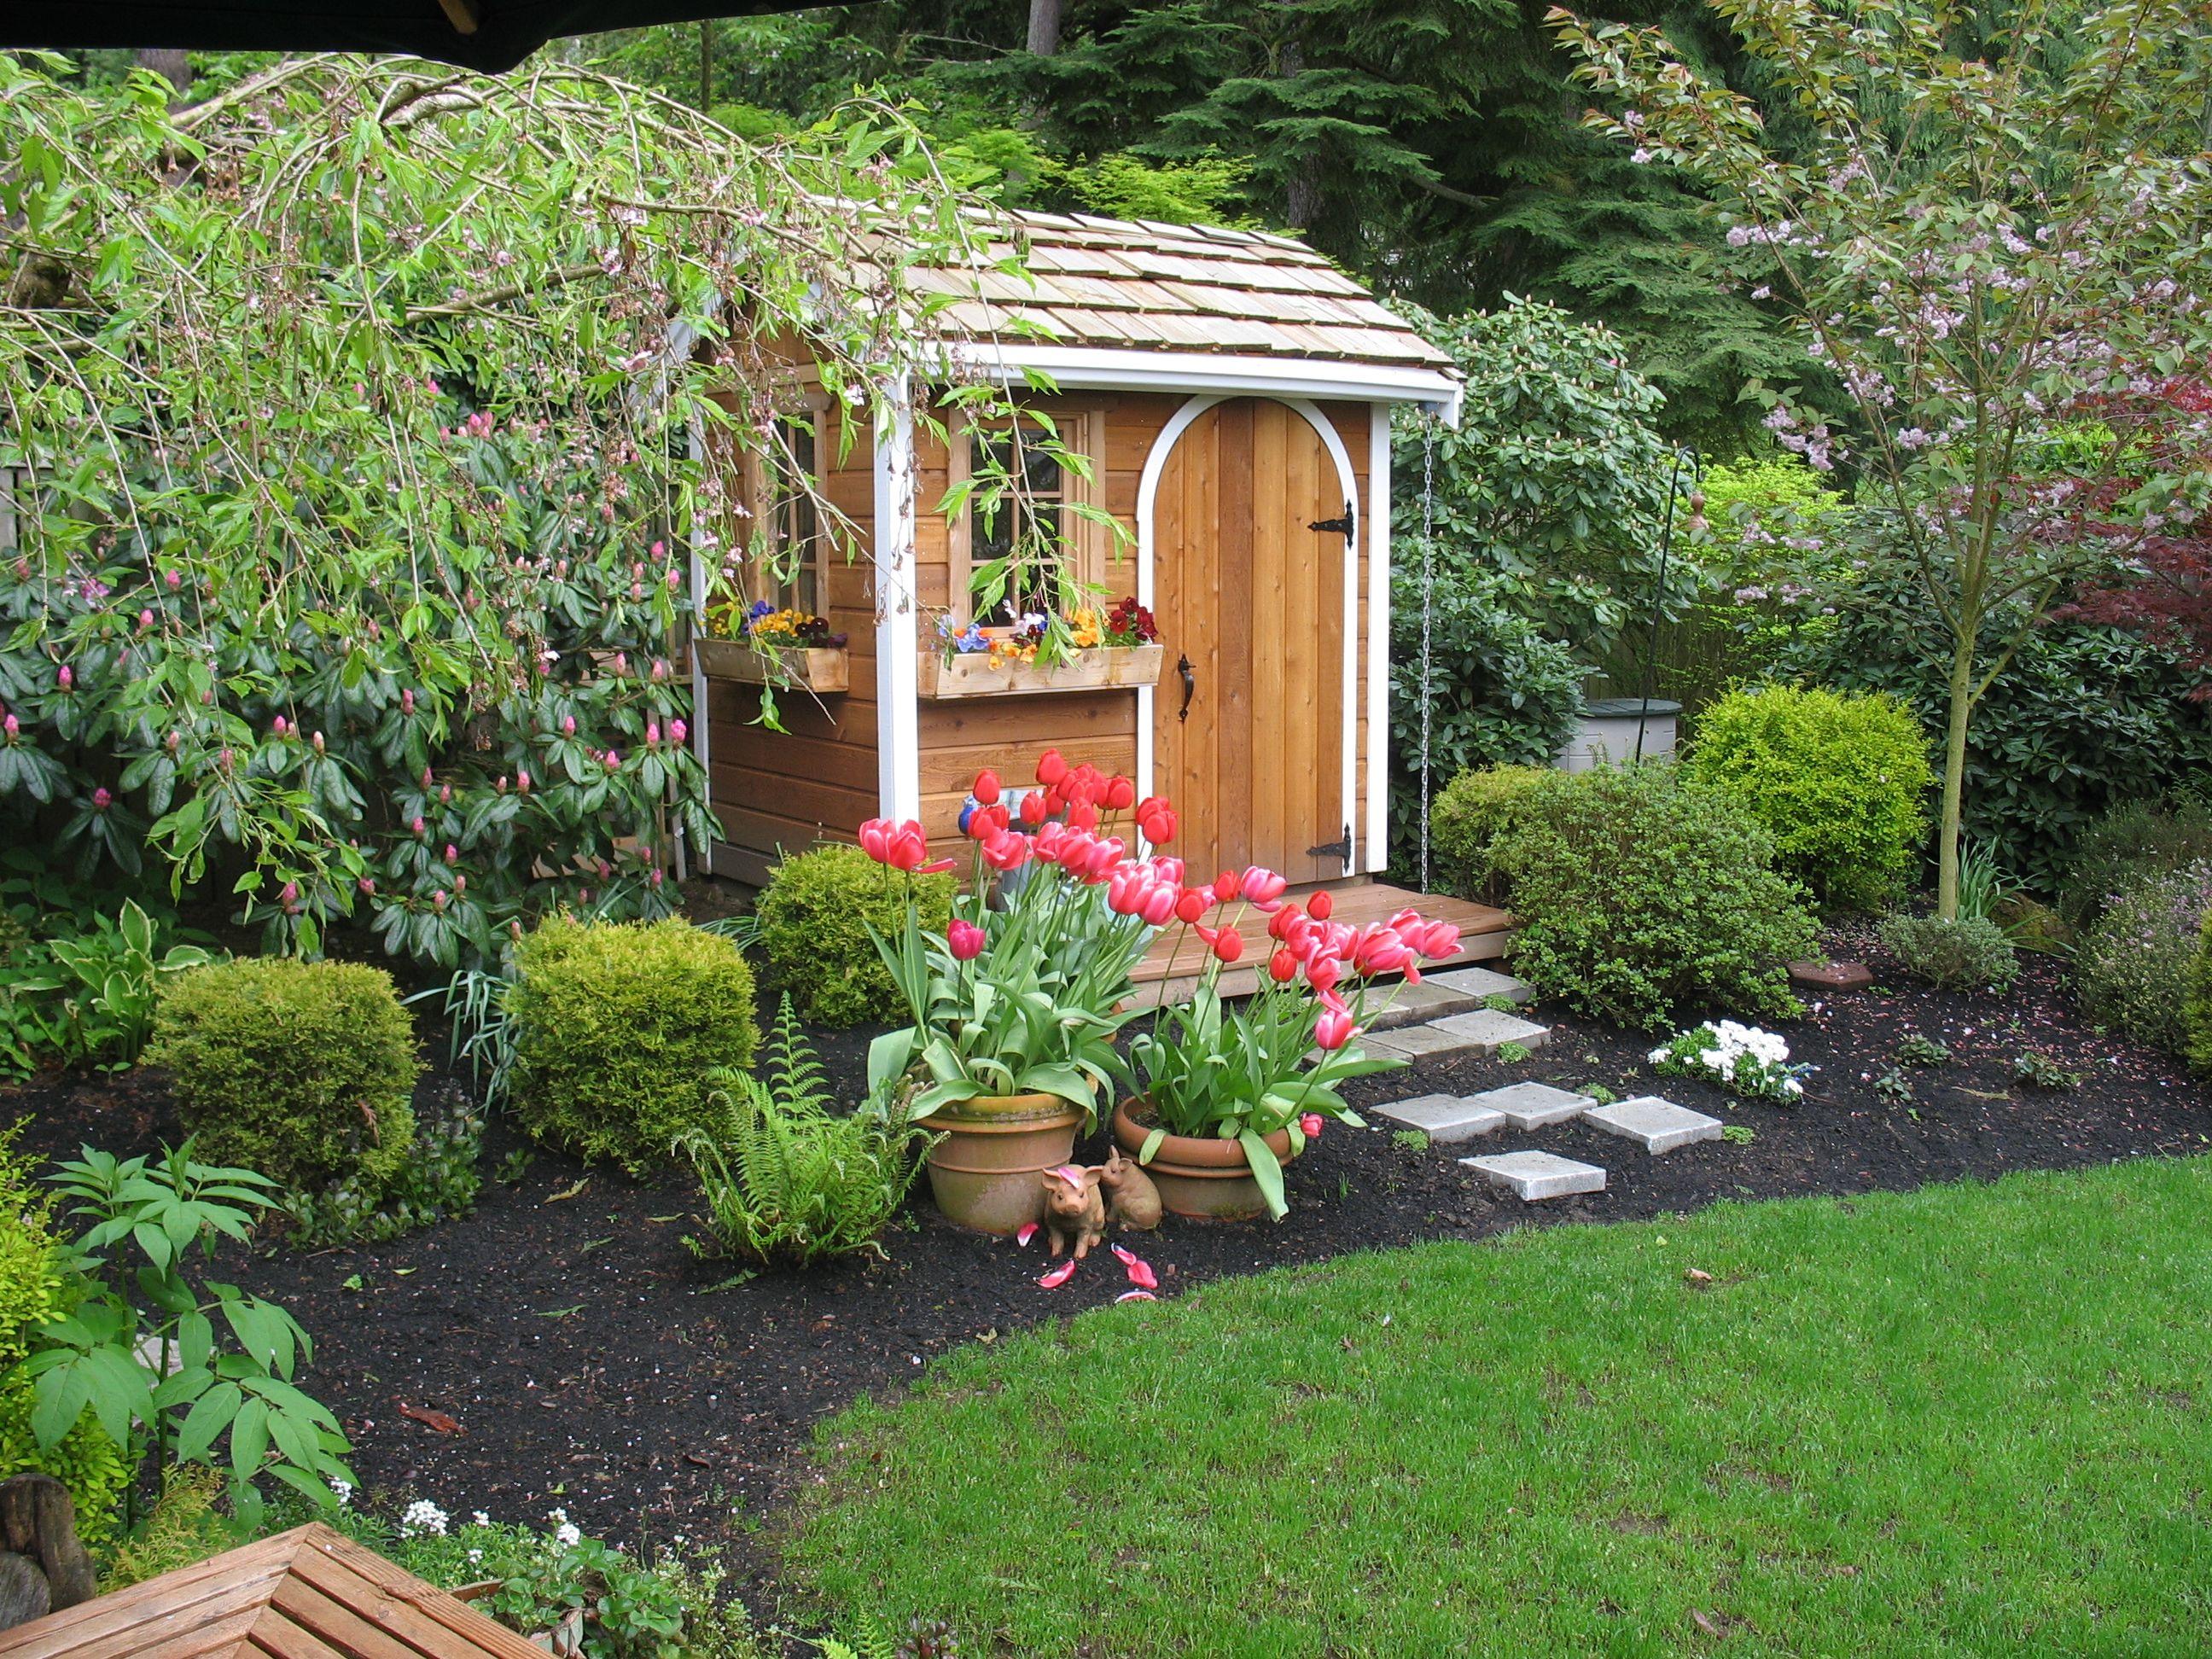 palmerston shed in cincinnati ohio - Garden Sheds Ohio